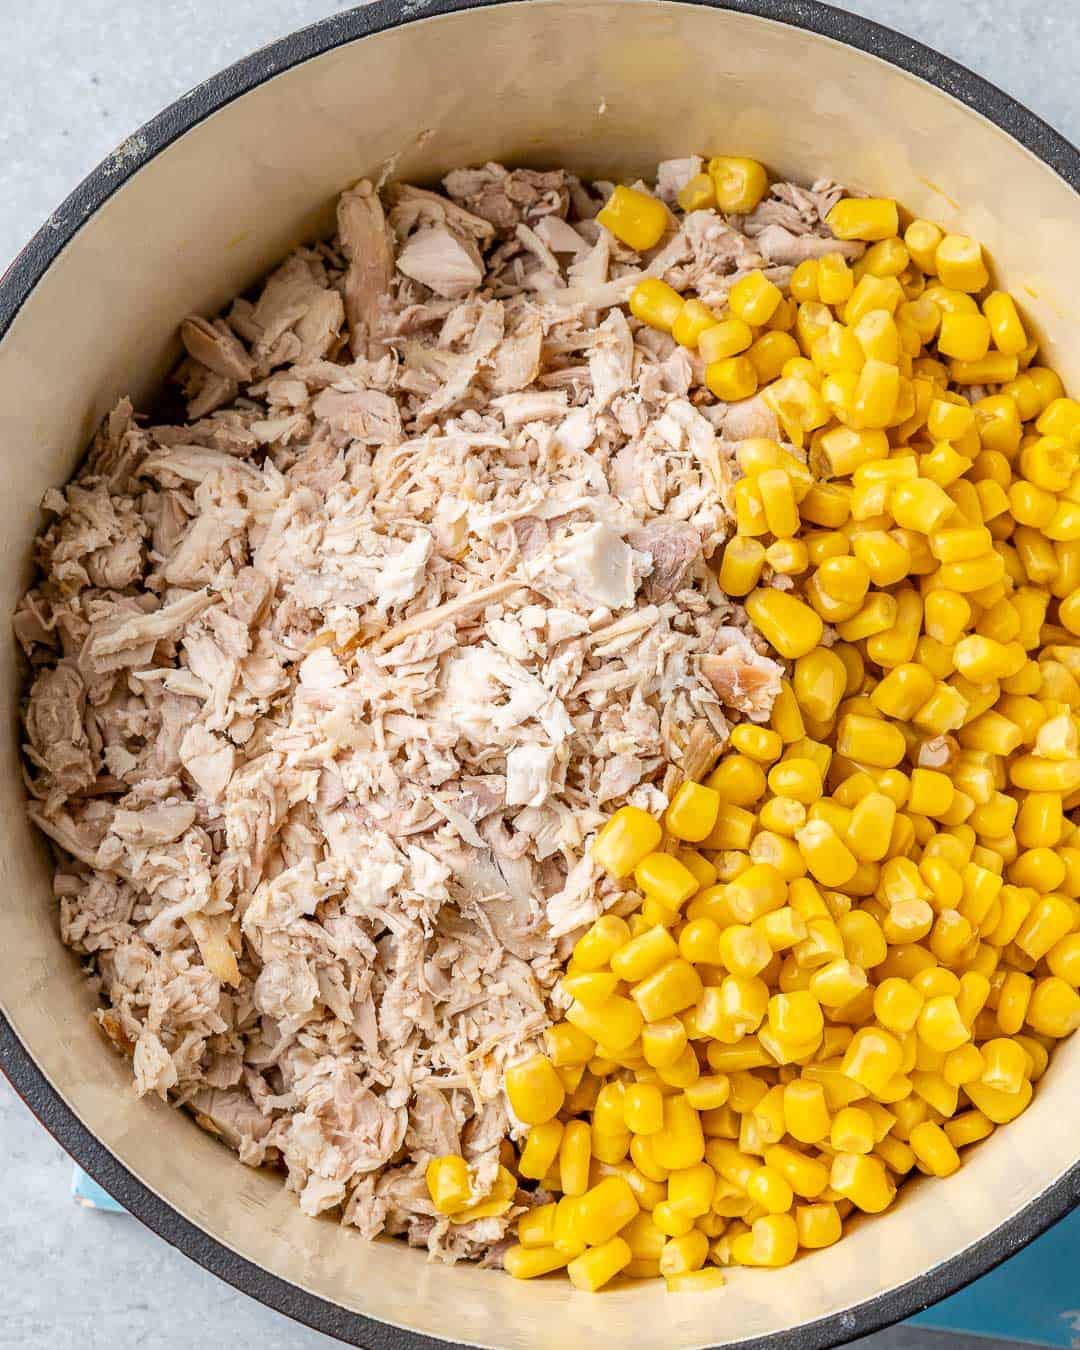 Shredded turkey and corn in pot.